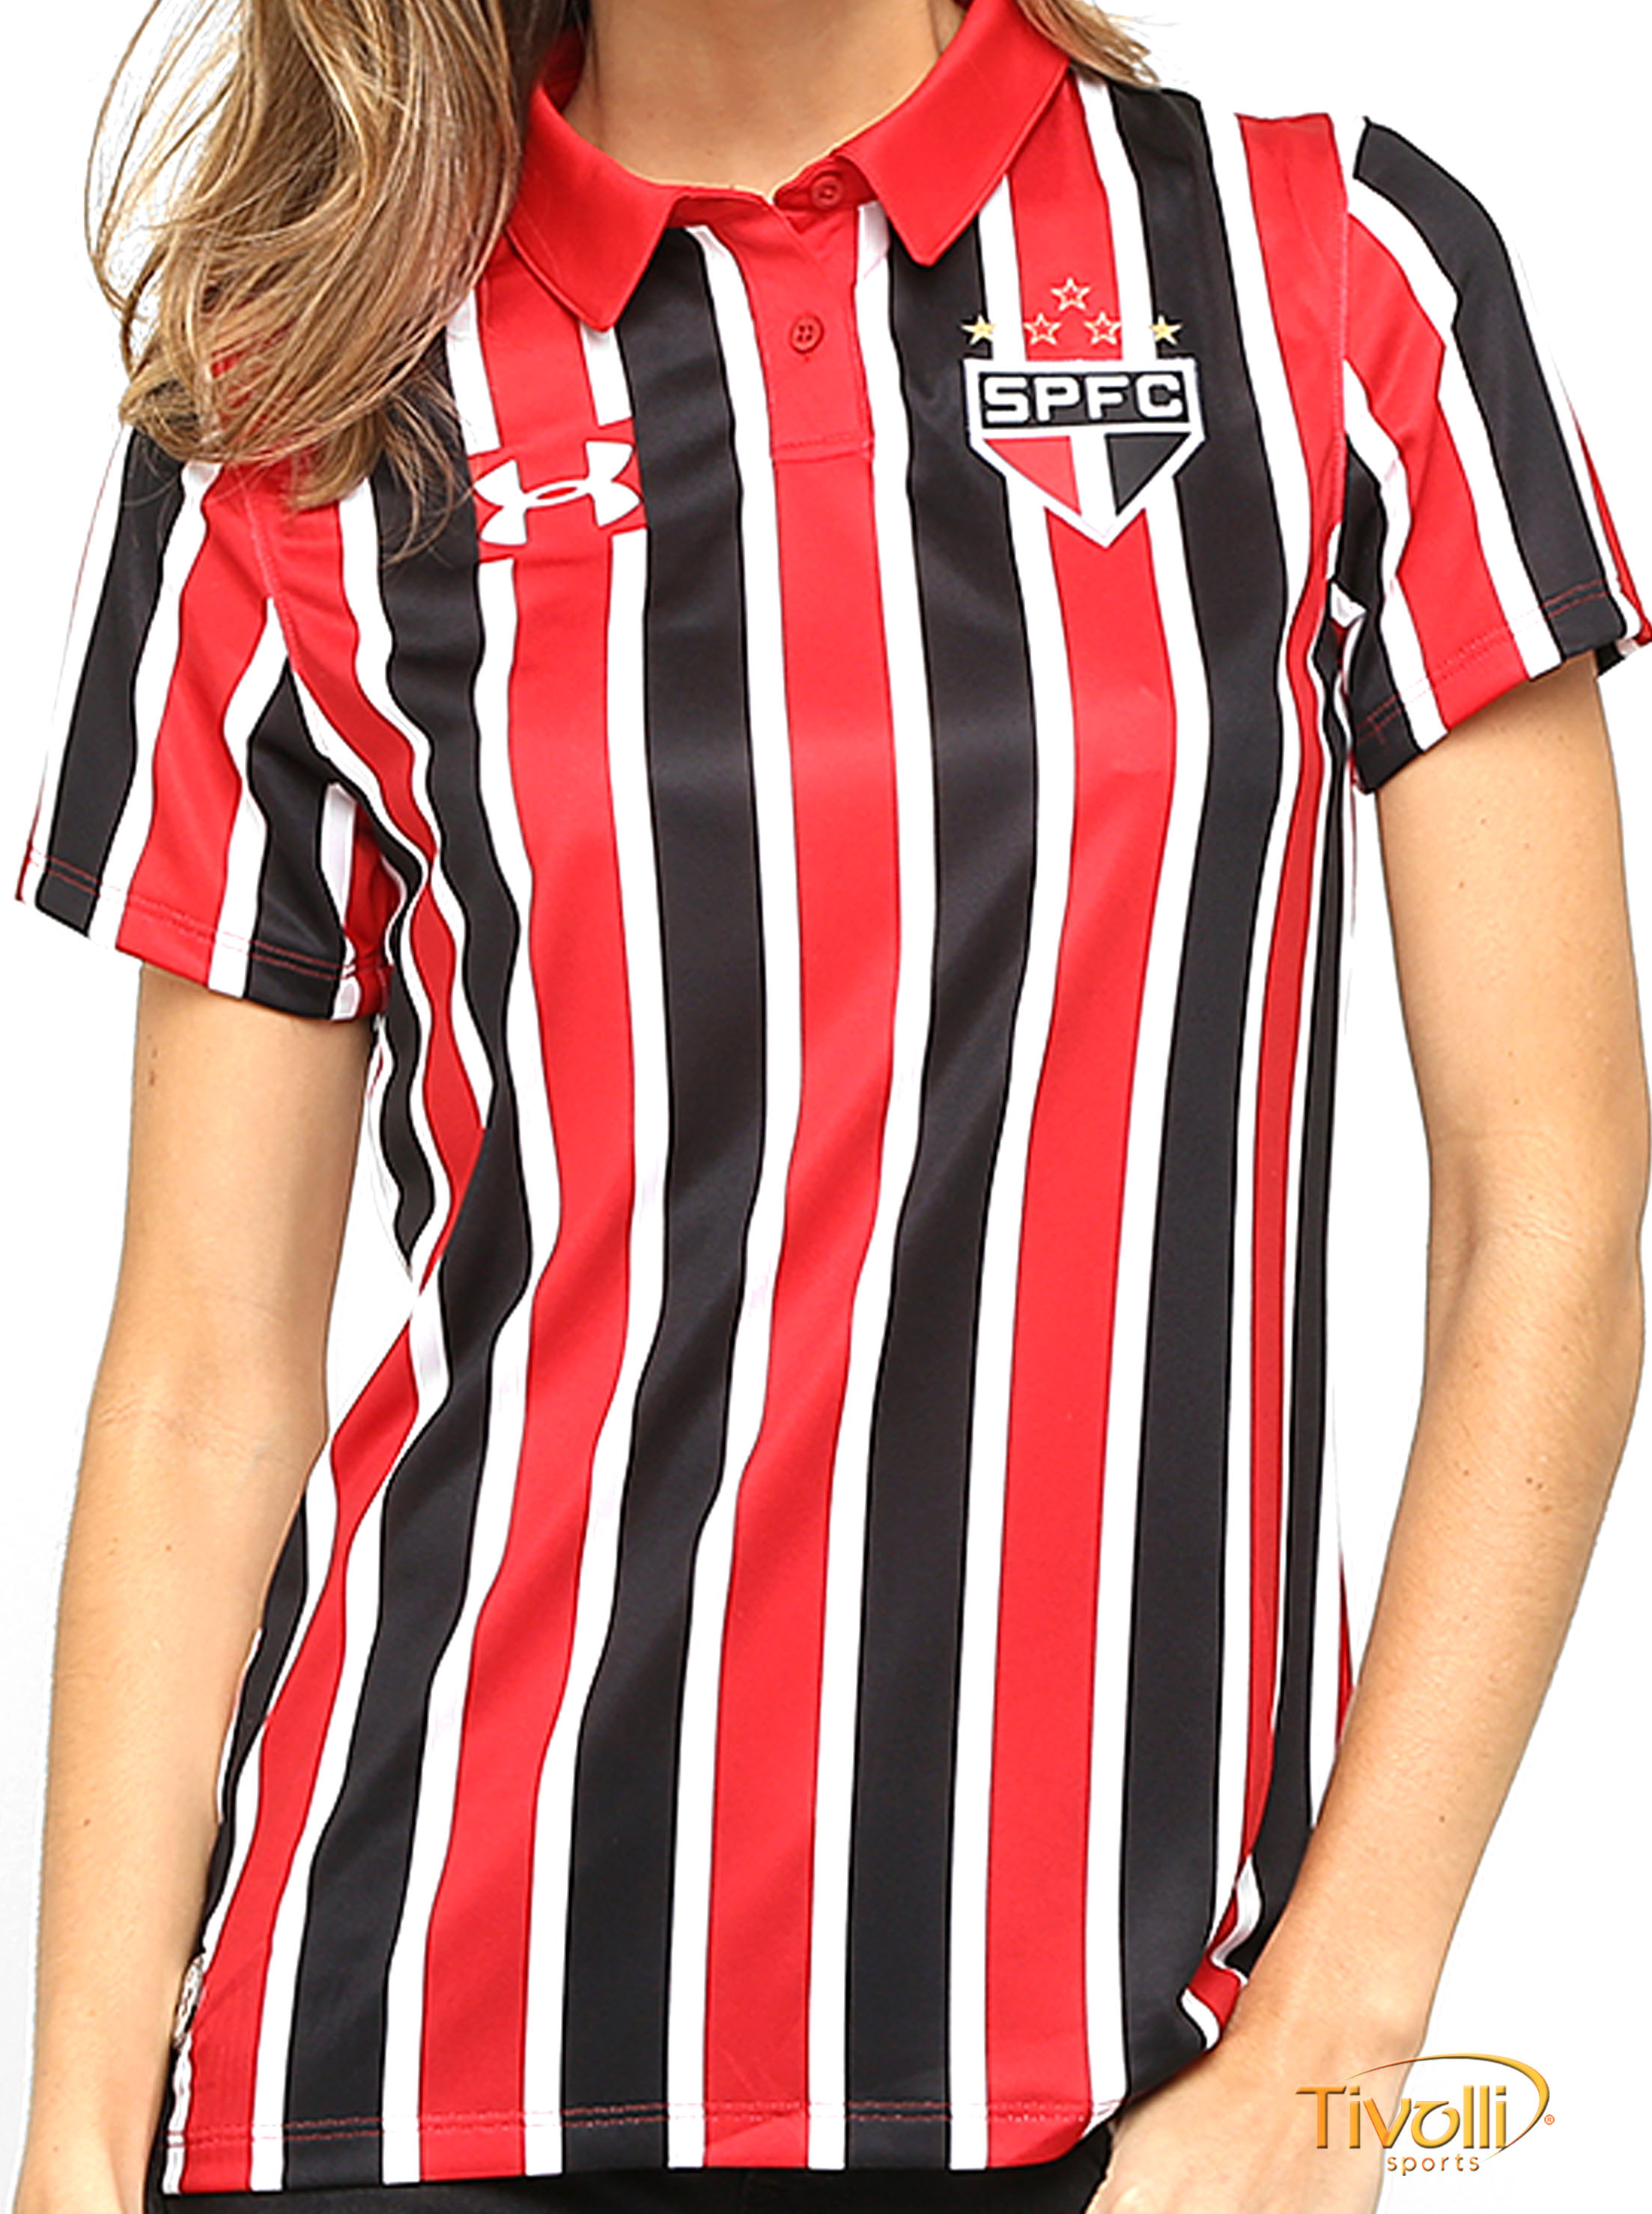 c85078f74dc03 Camisa São Paulo SPFC II Away 2016 Under Armour   Feminina Vermelha ...